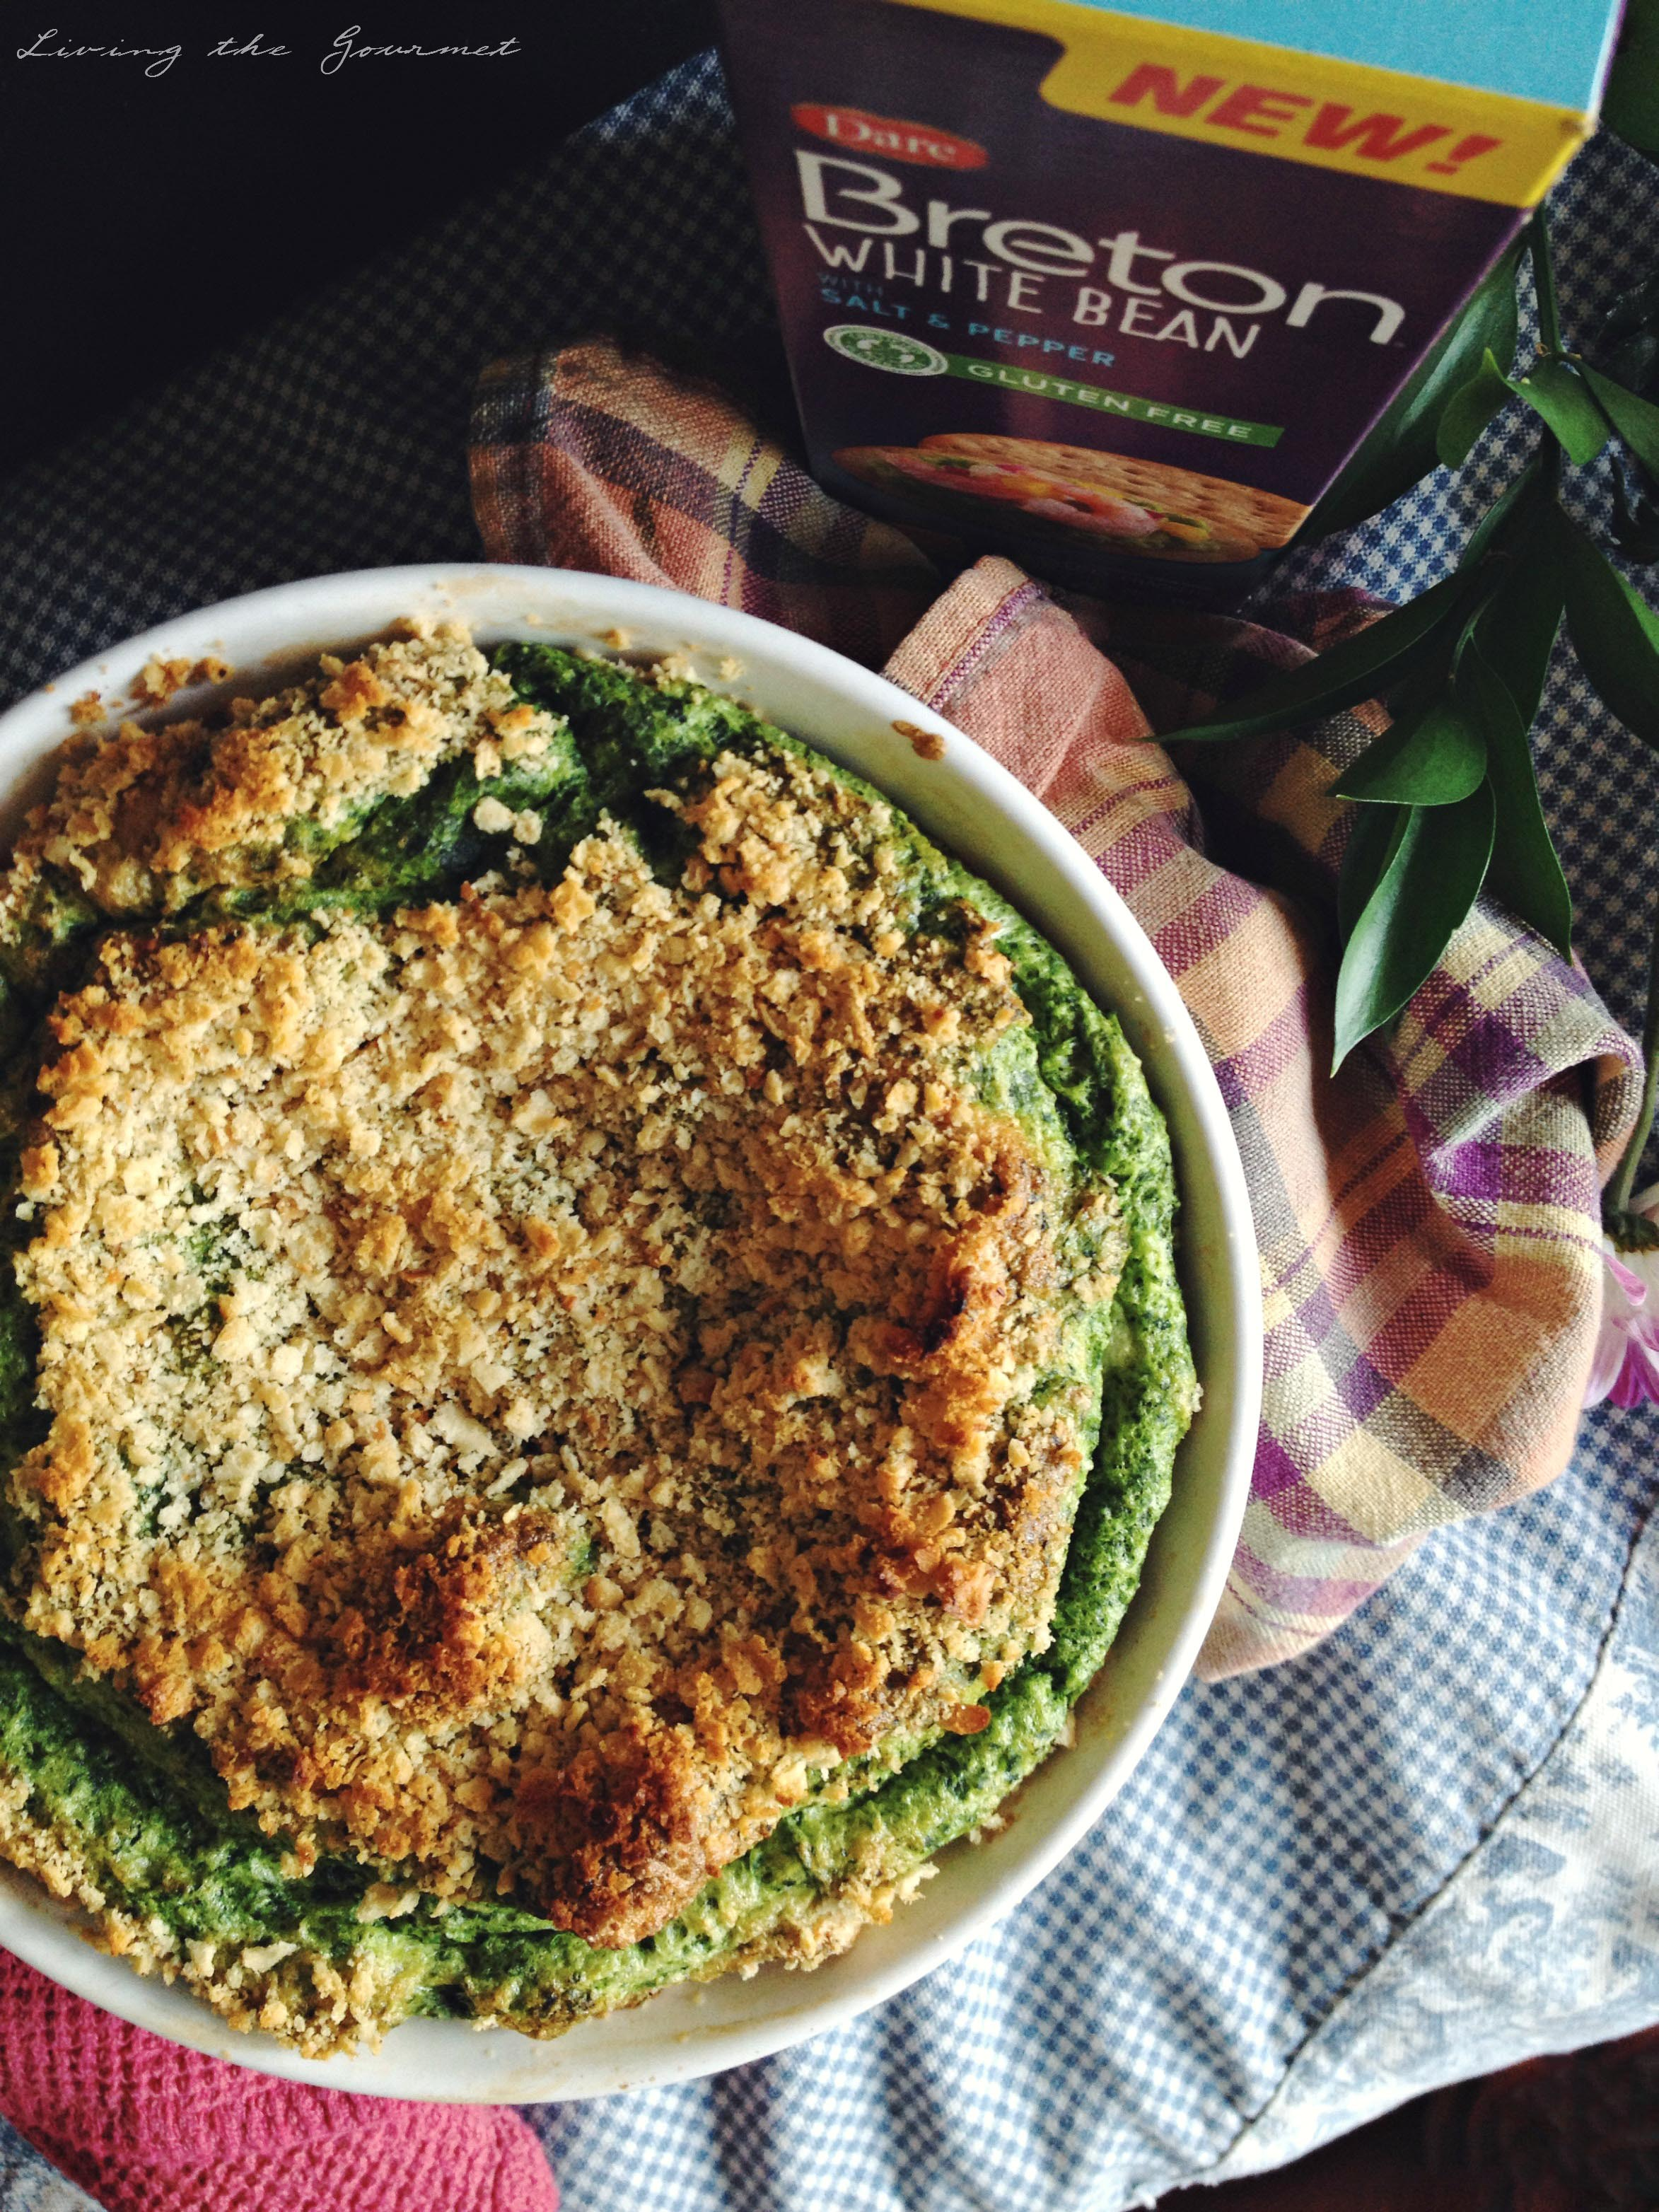 Living the Gourmet: Gluten Free Spinach & Goat Cheese Soufflé